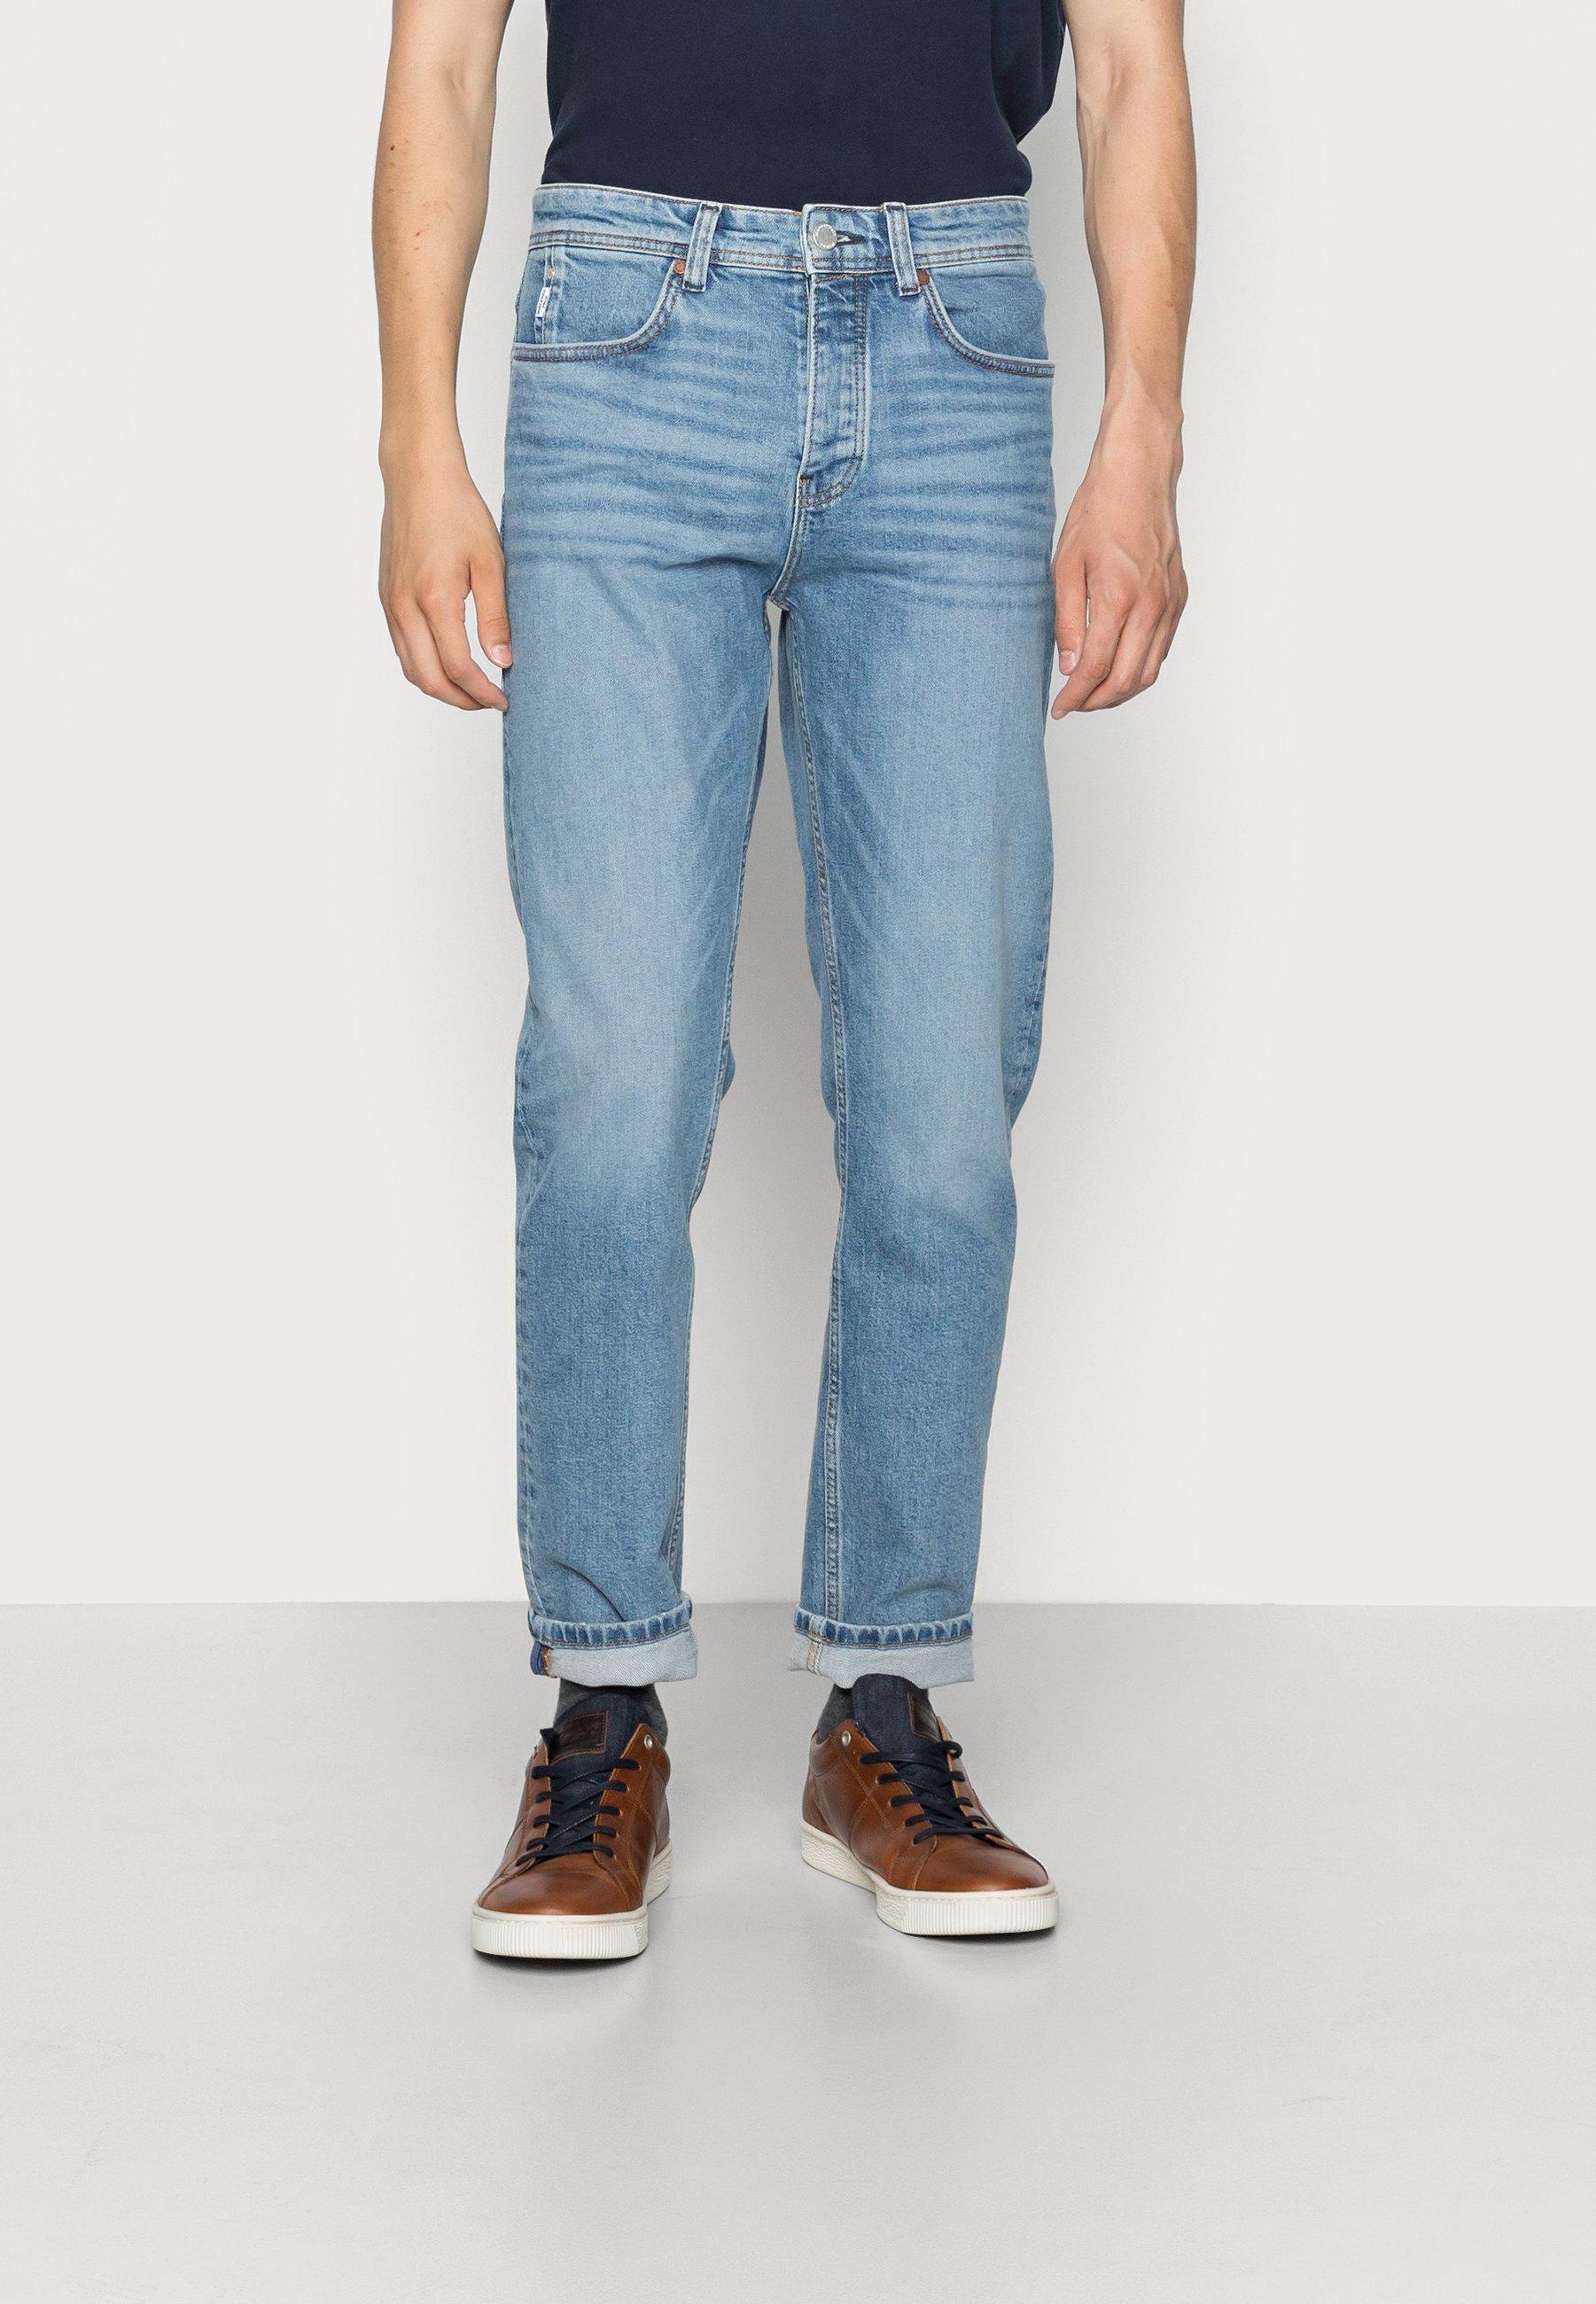 Uomo 5 POCKET SLIM FIT TAPERED LEG REGULAR WAIST COVERED - Jeans slim fit